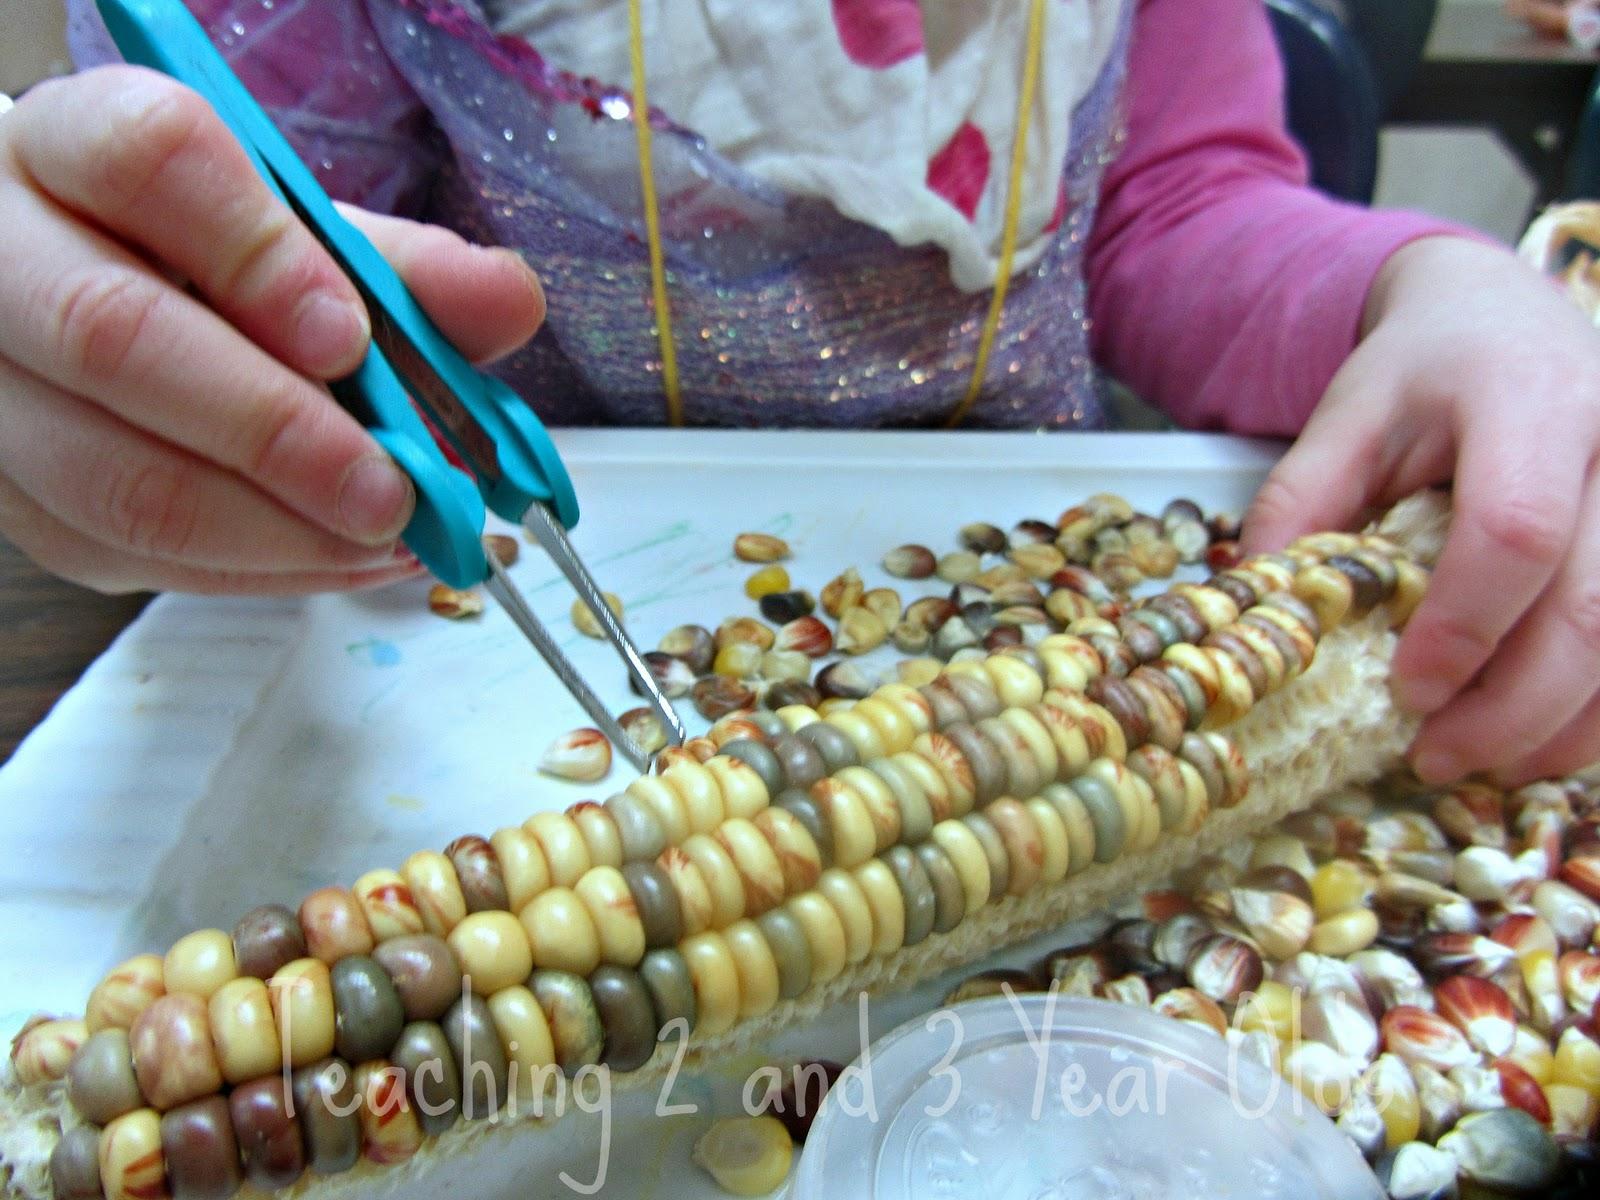 Tweezing Indian Corn